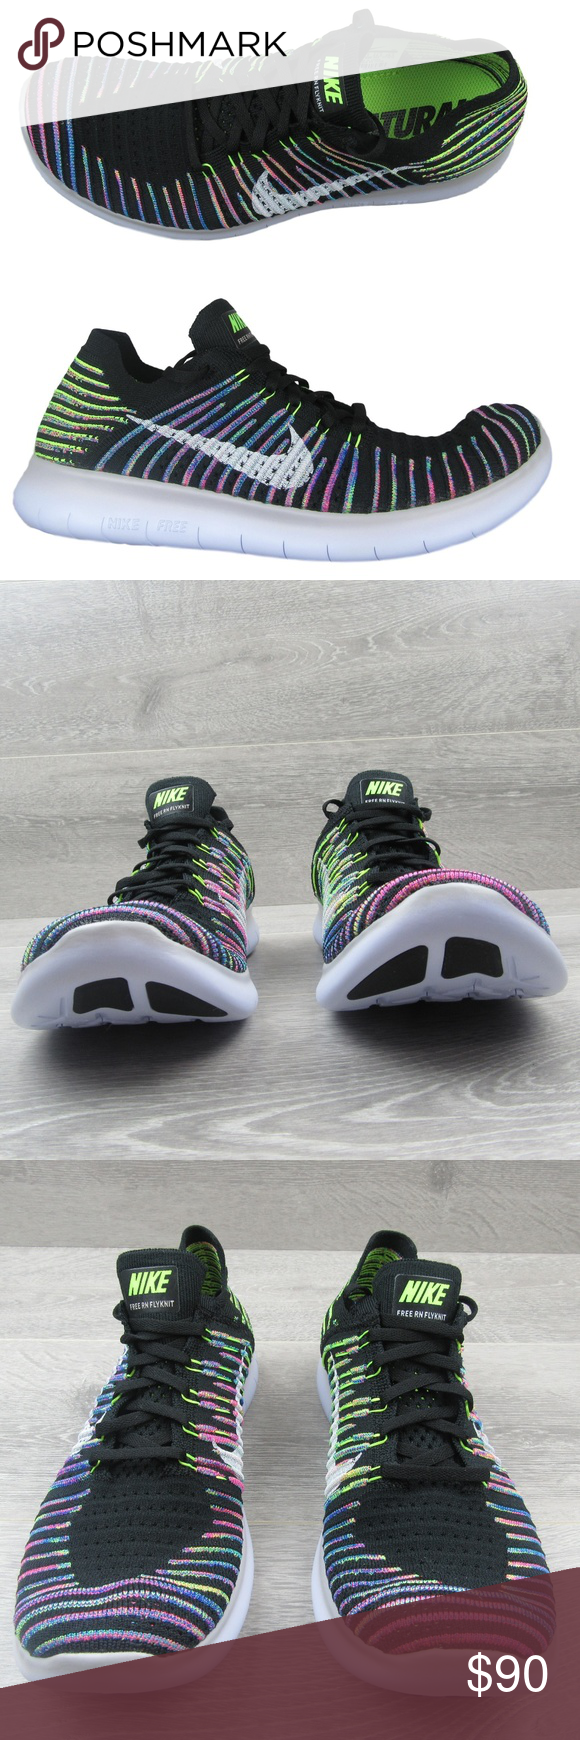 cb875da509a Nike Free RN Flyknit Running Shoes Size 10.5 Mens Nike Free RN Flyknit  Running Shoes Mens